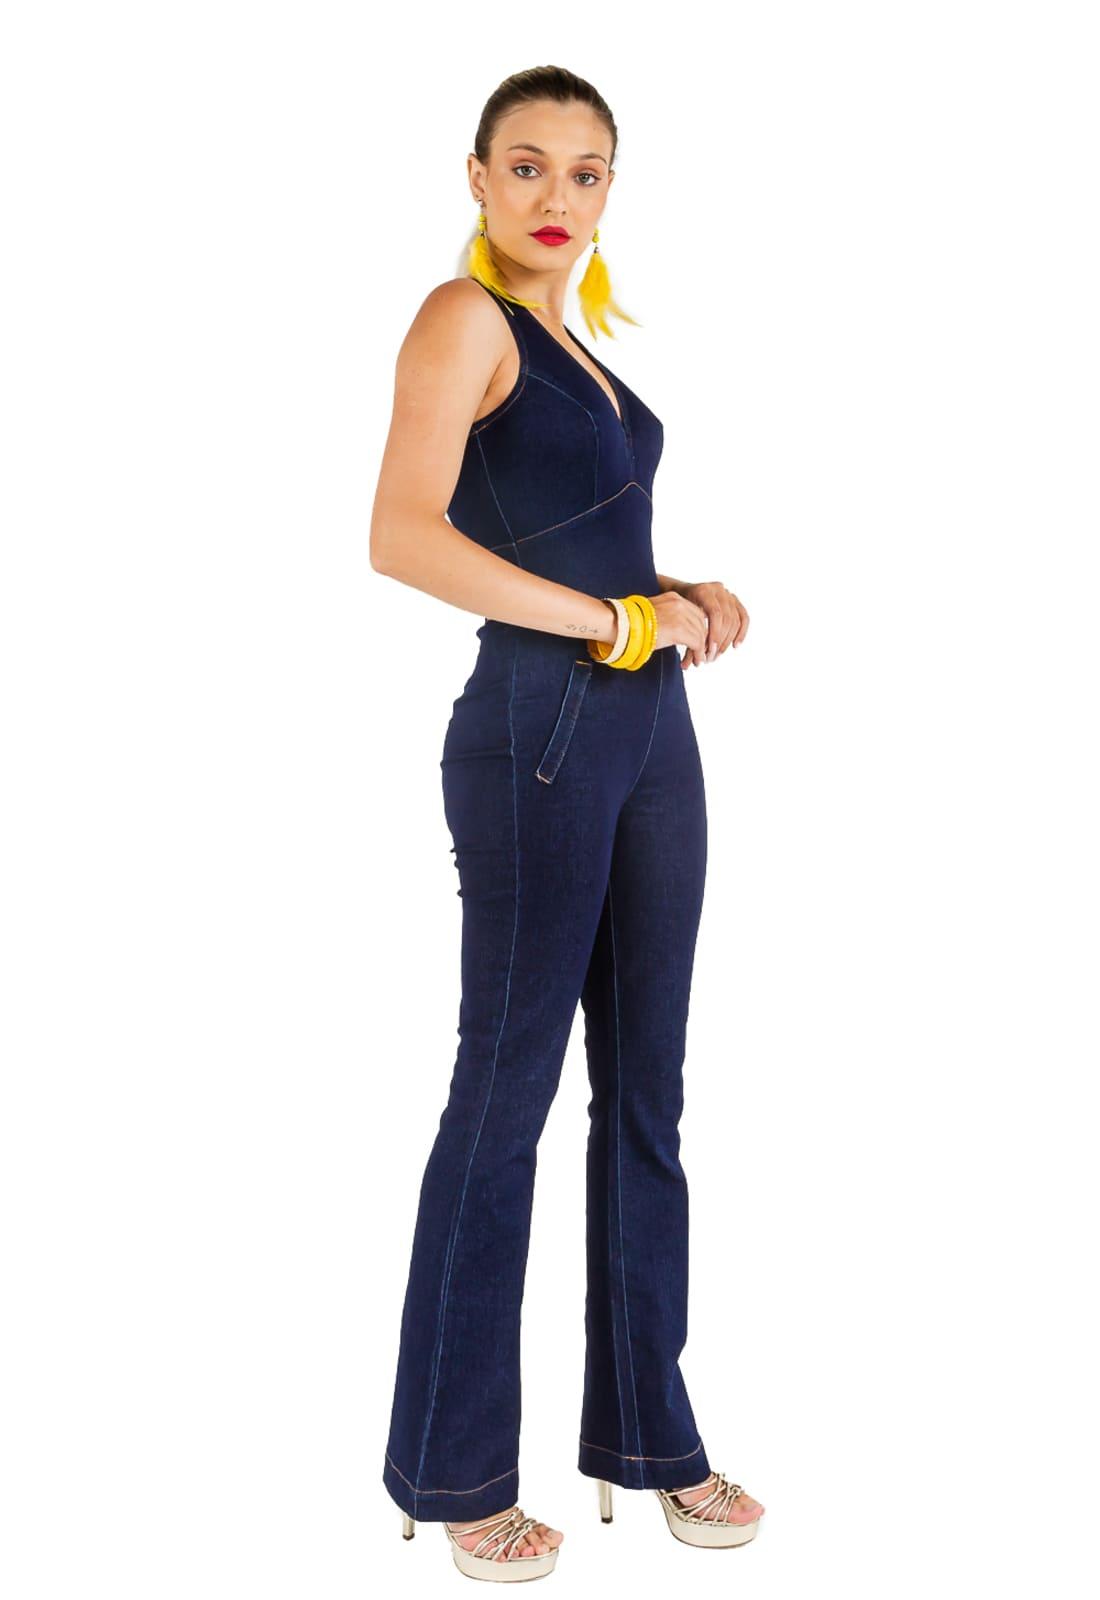 Macacão Jeans Justo